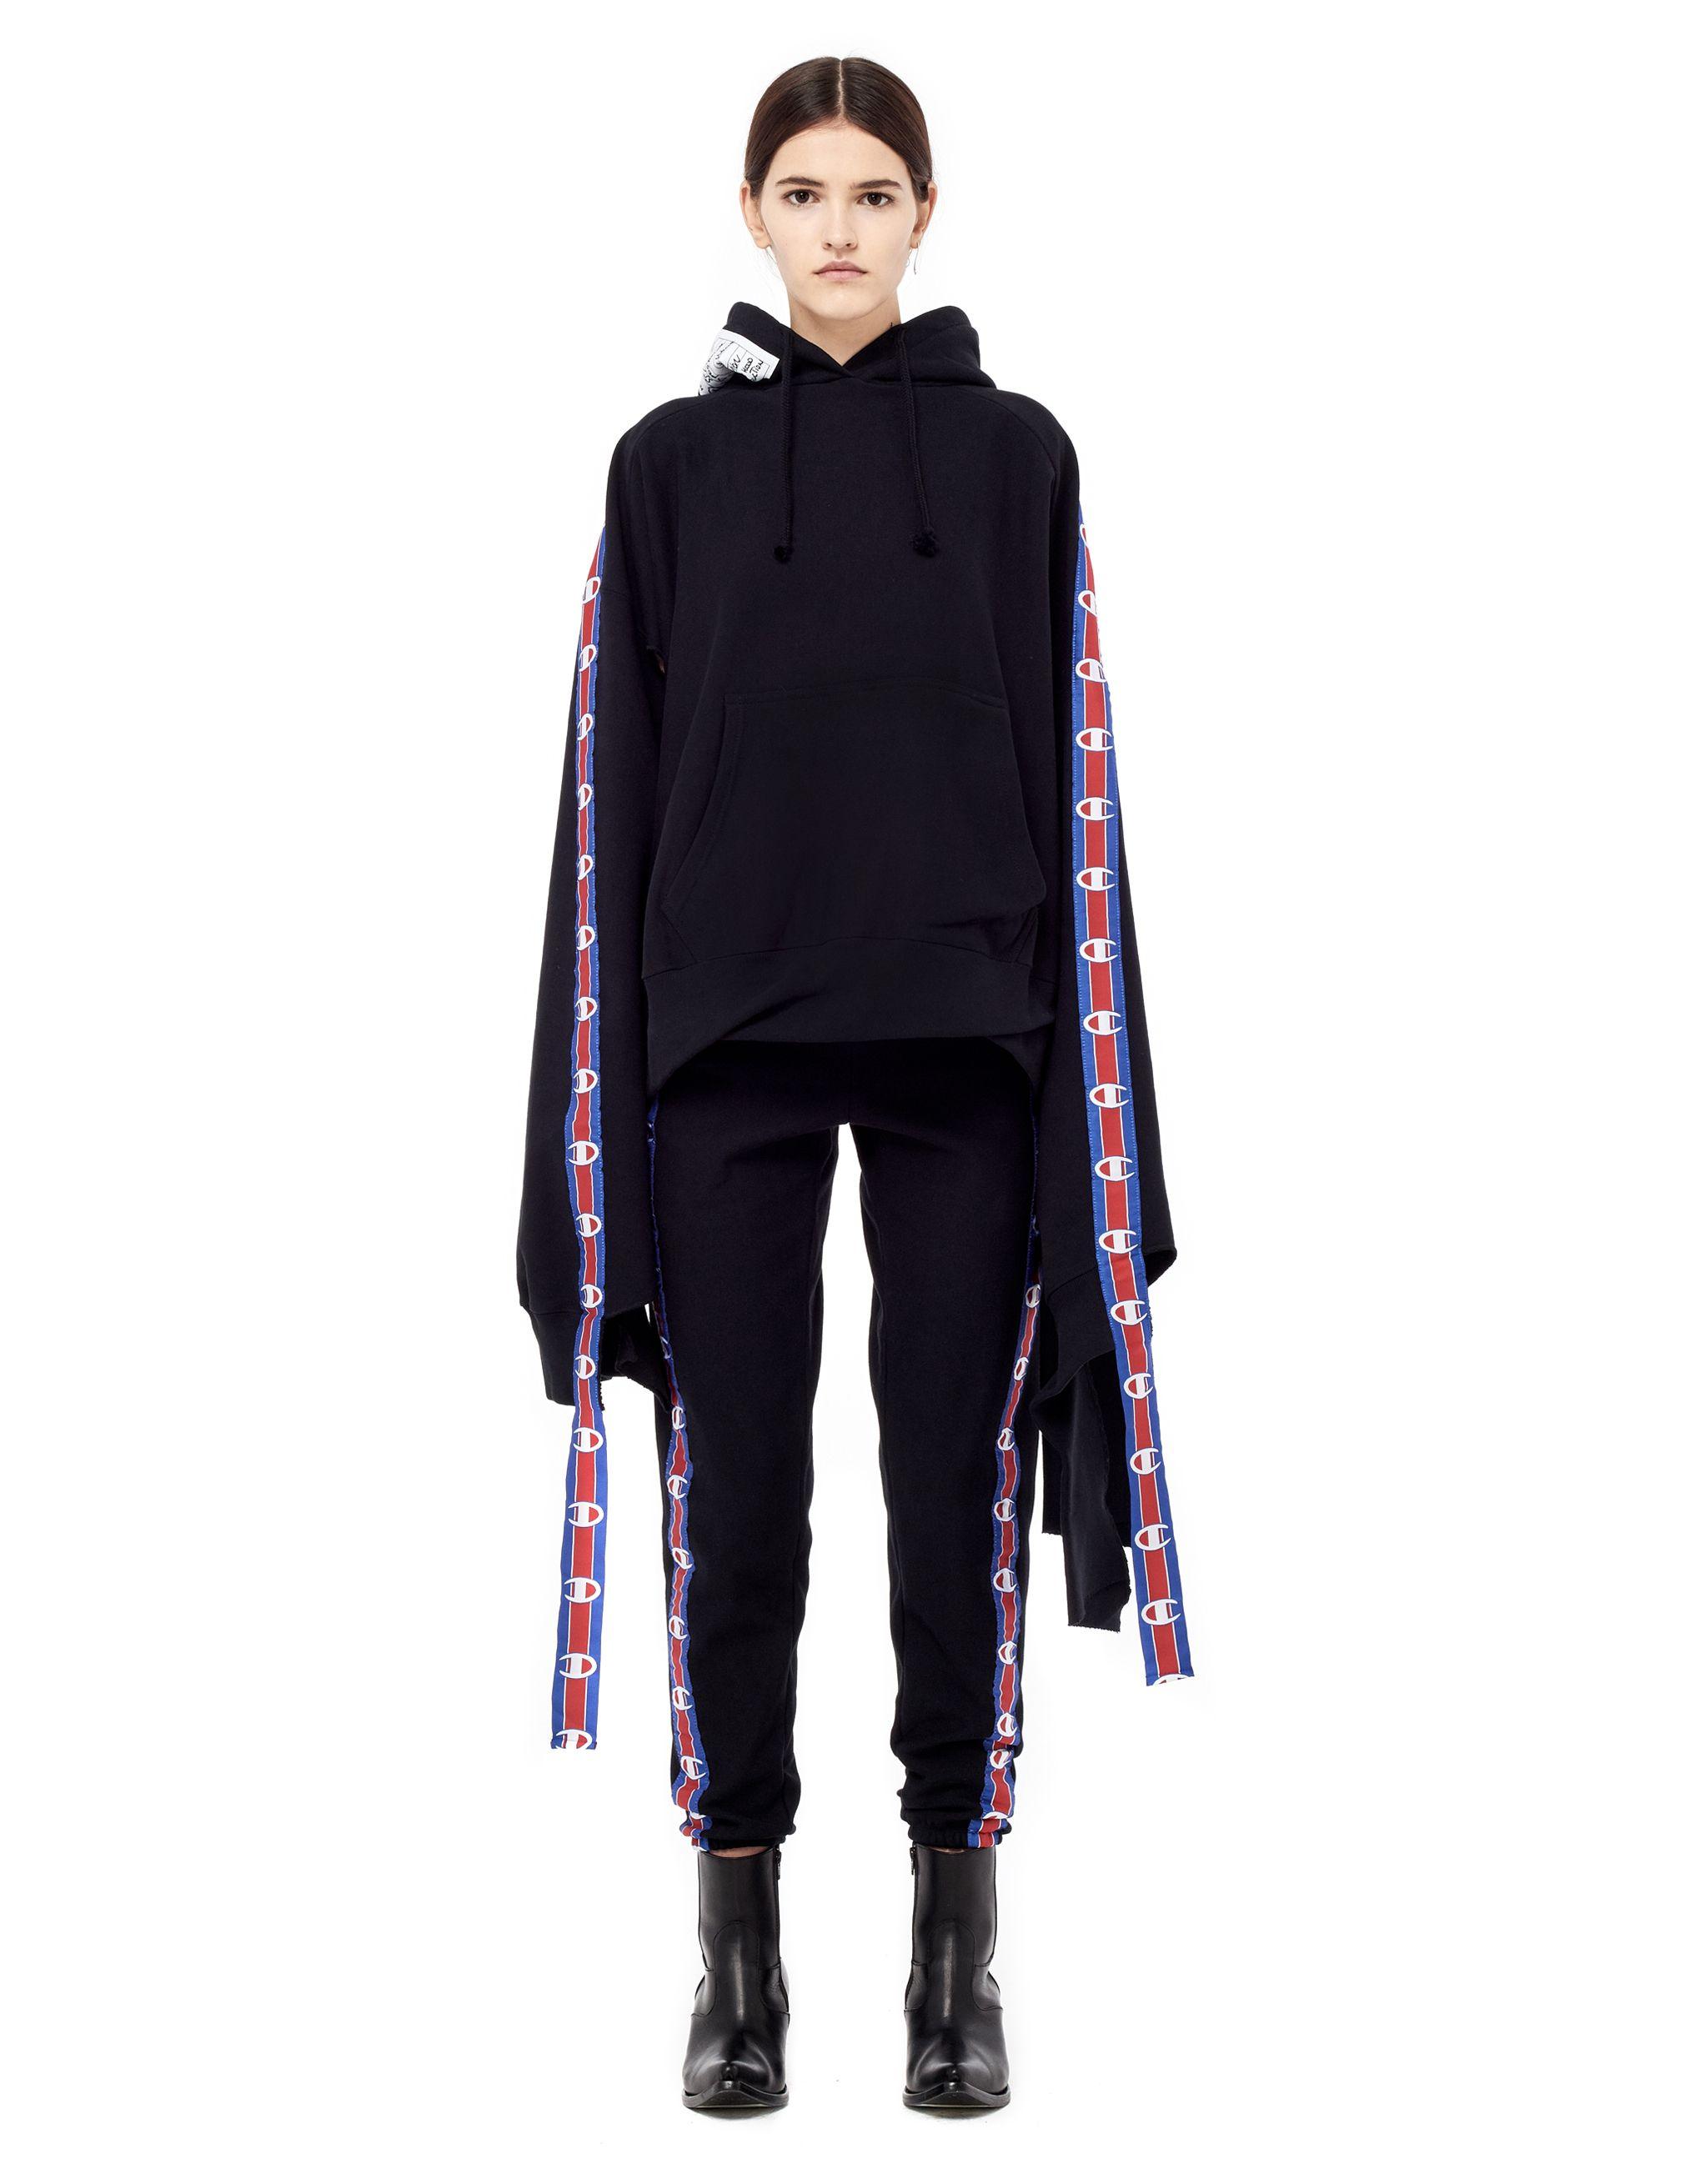 a08eca128a0965 Champion' hoodie by Vetements | Runway Fashion | Fashion, Trendy ...